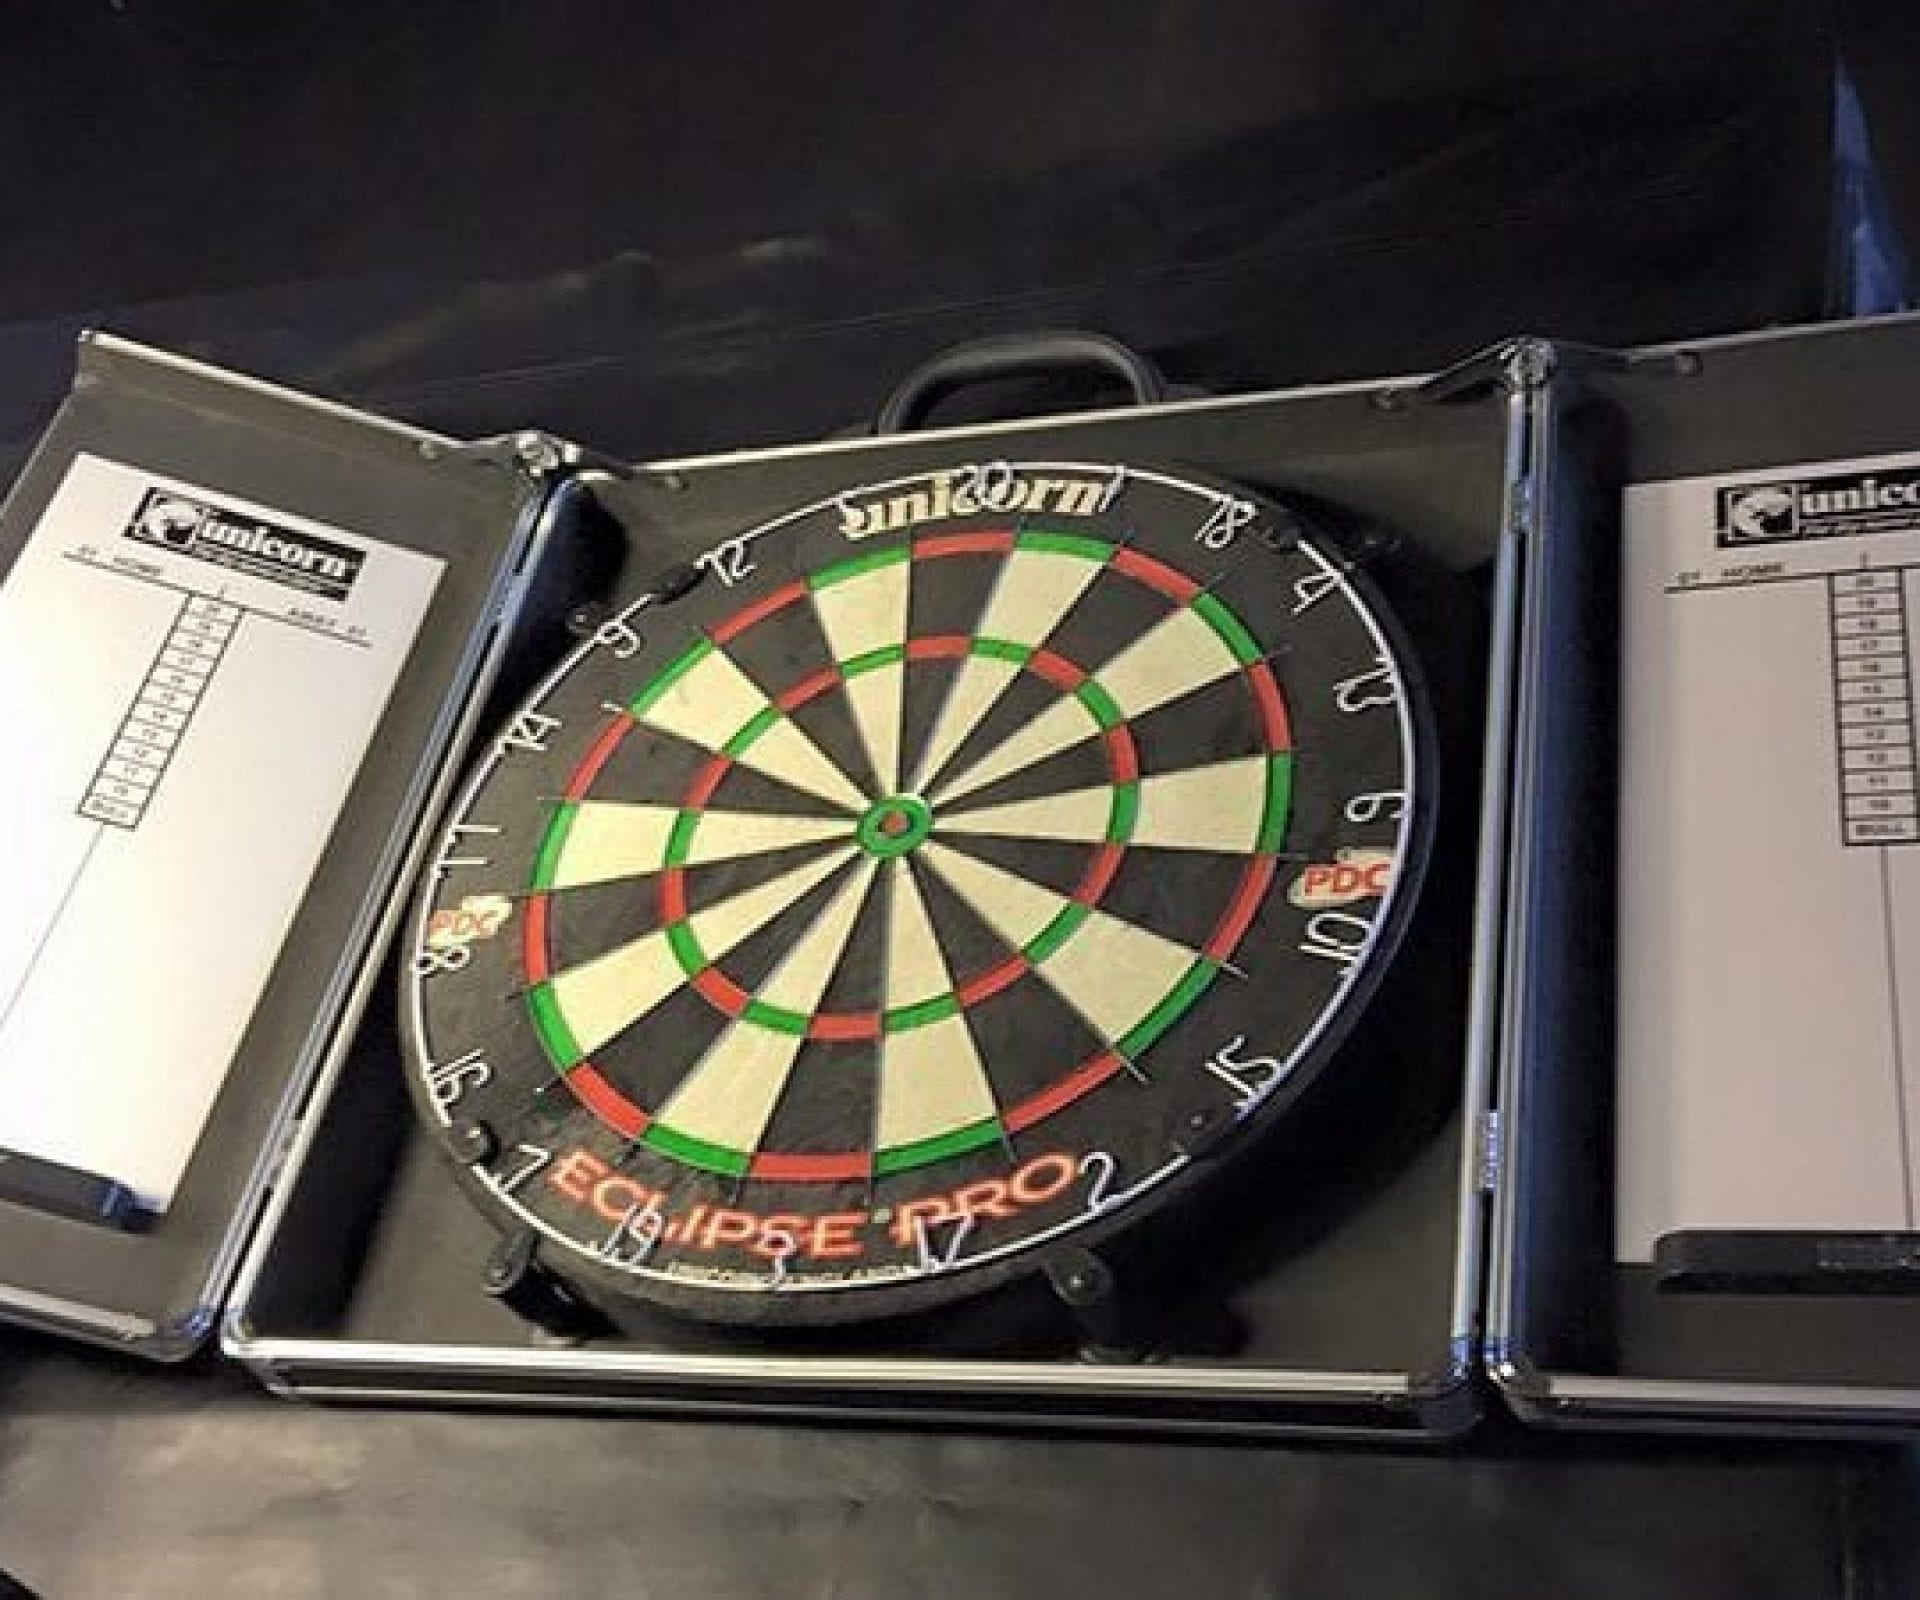 Seoul International Darts League | SIDL